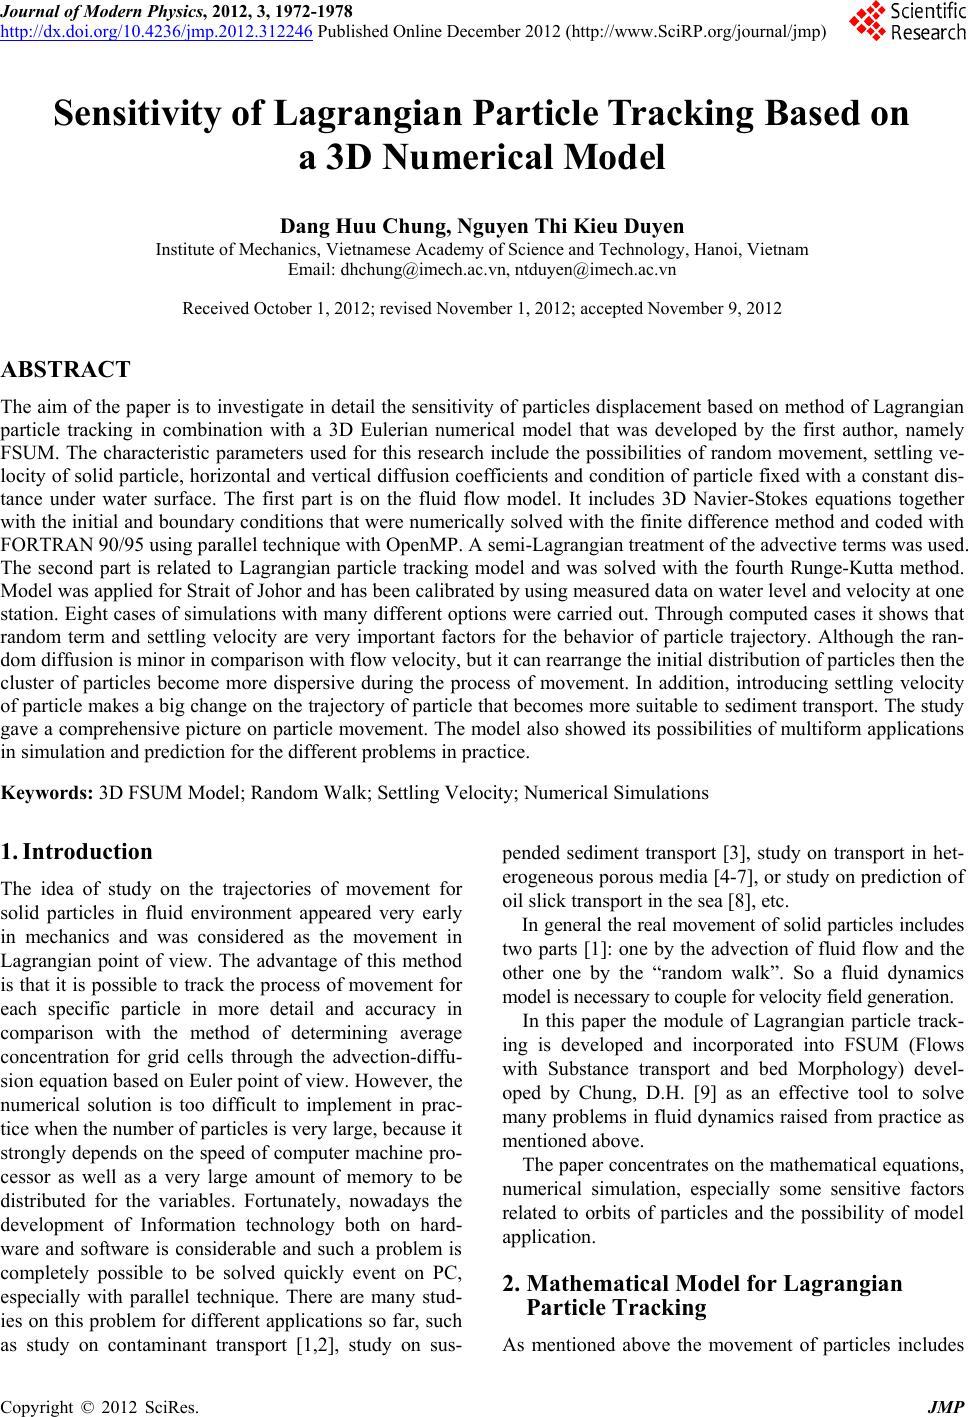 lagrangian and hamiltonian mechanics book pdf